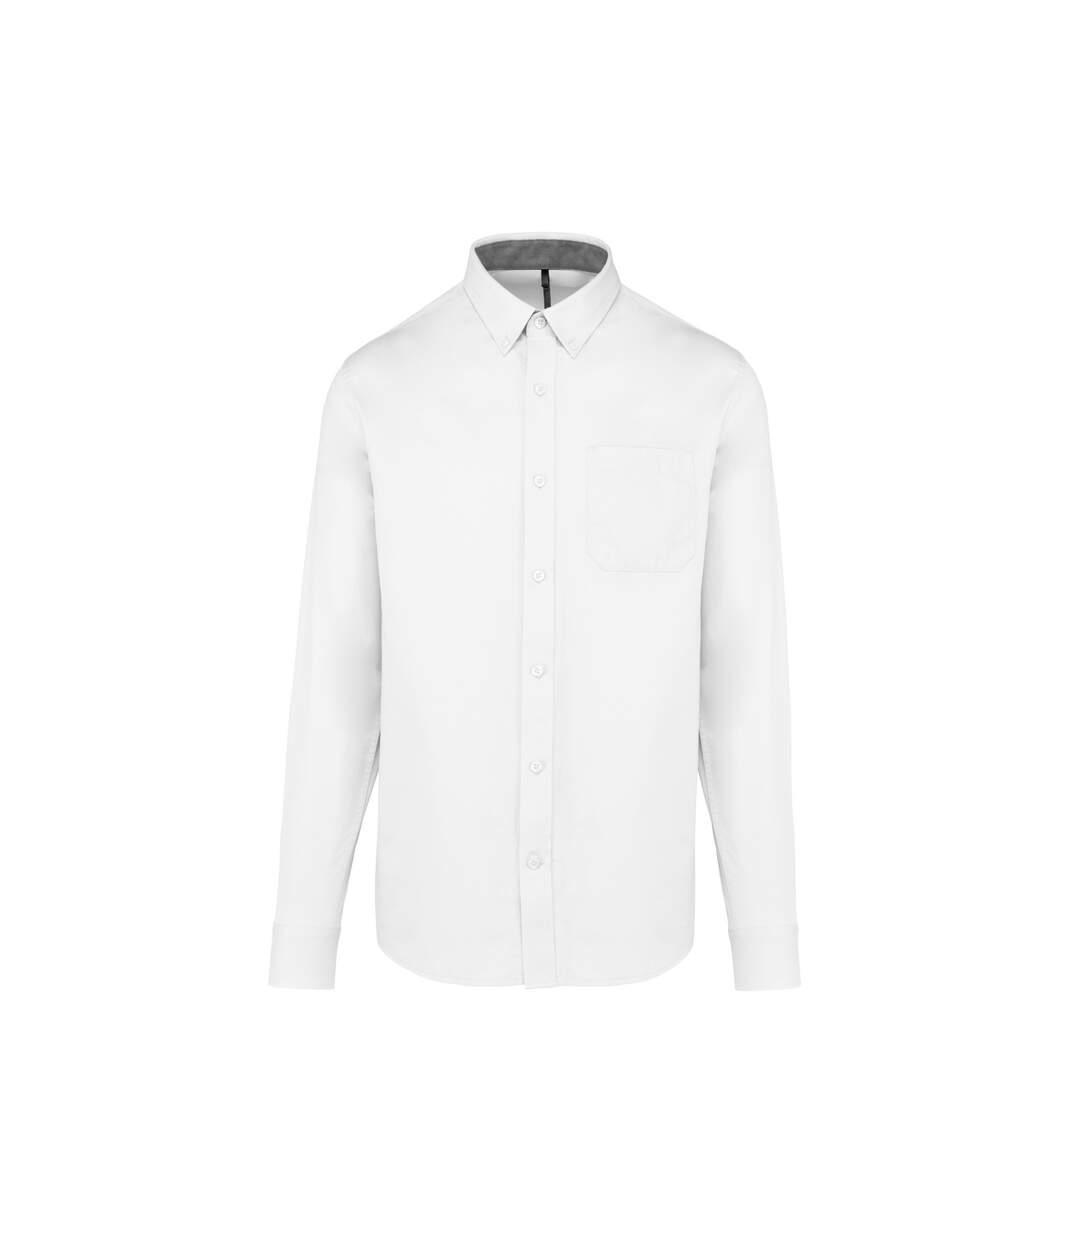 Kariban Mens Nevada Shirt (White) - UTRW7484